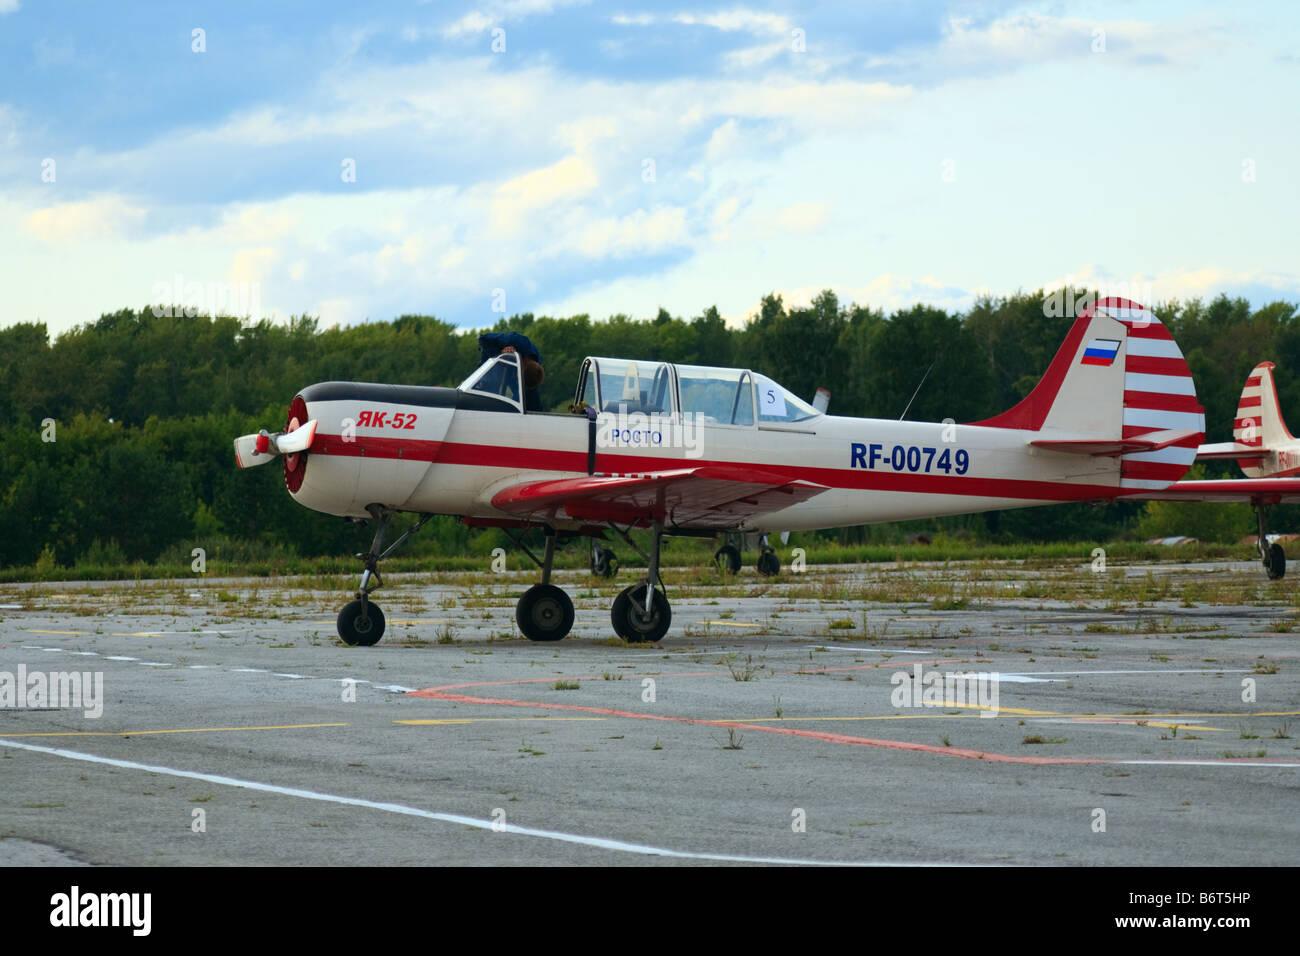 Yak-52 aerobatic plane - Stock Image